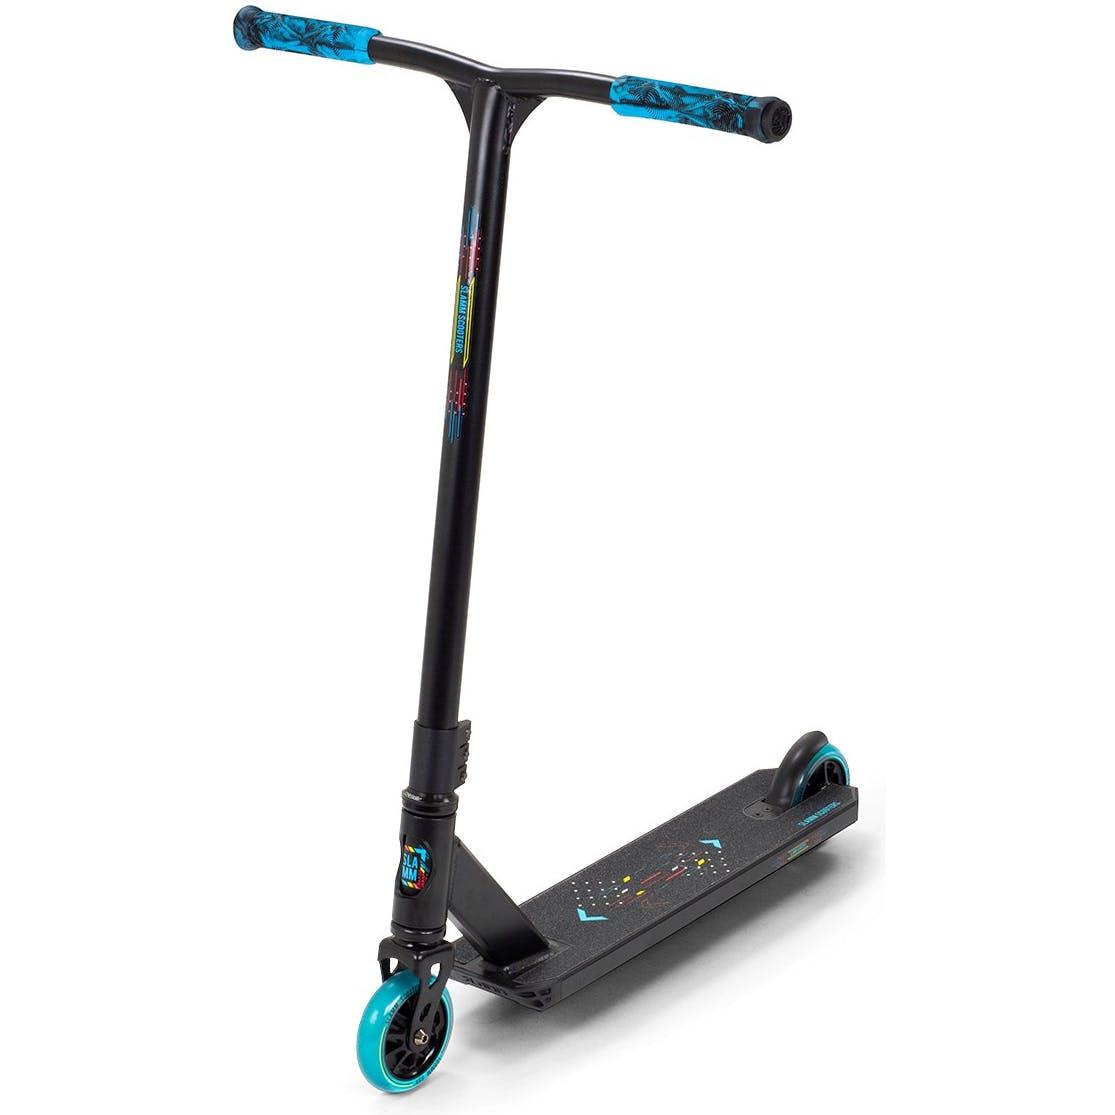 Slamm Classic V9 Stunt Scooter Blue